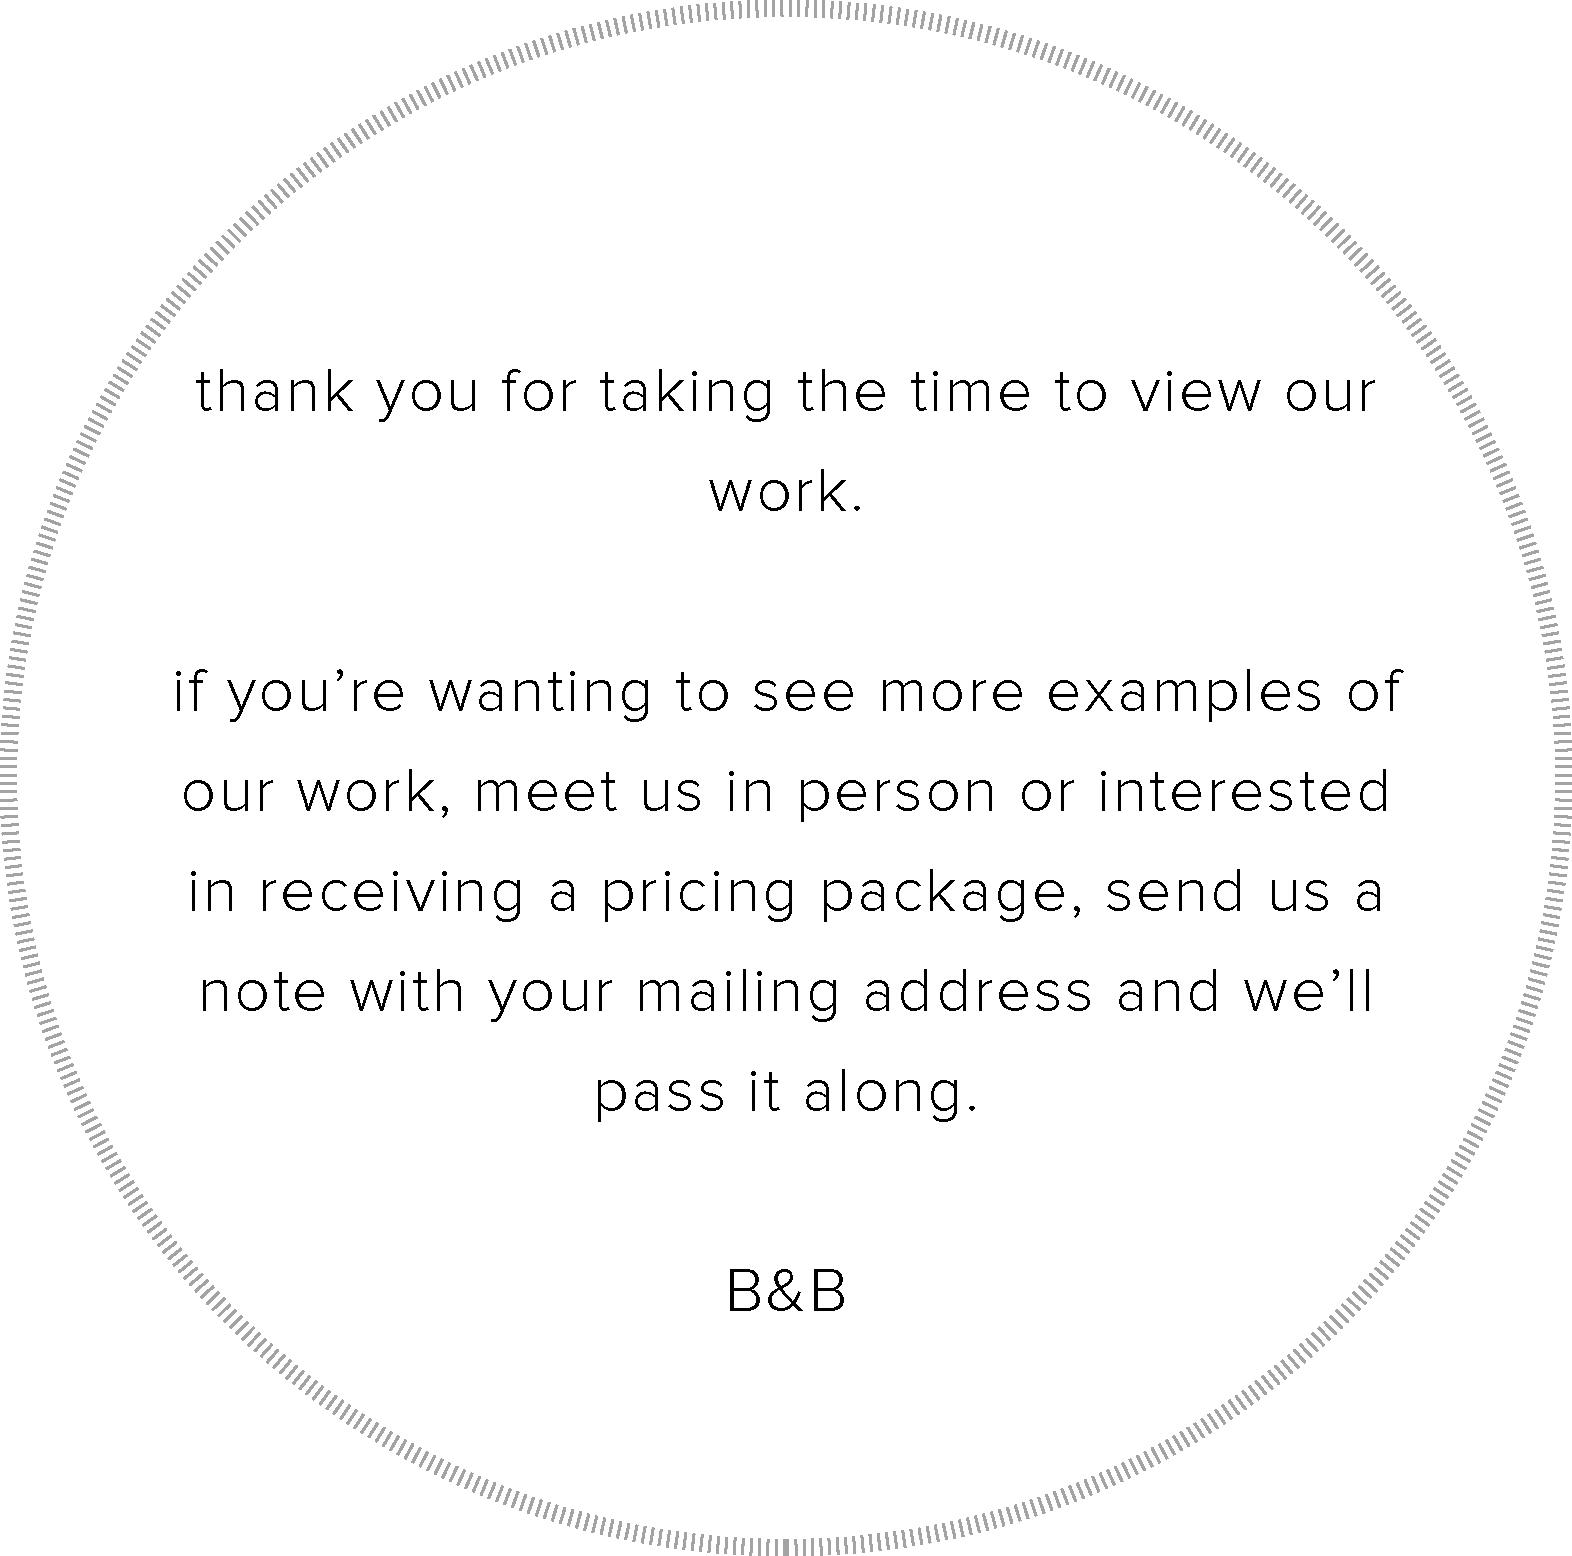 ContactPage_contacting_2.jpg